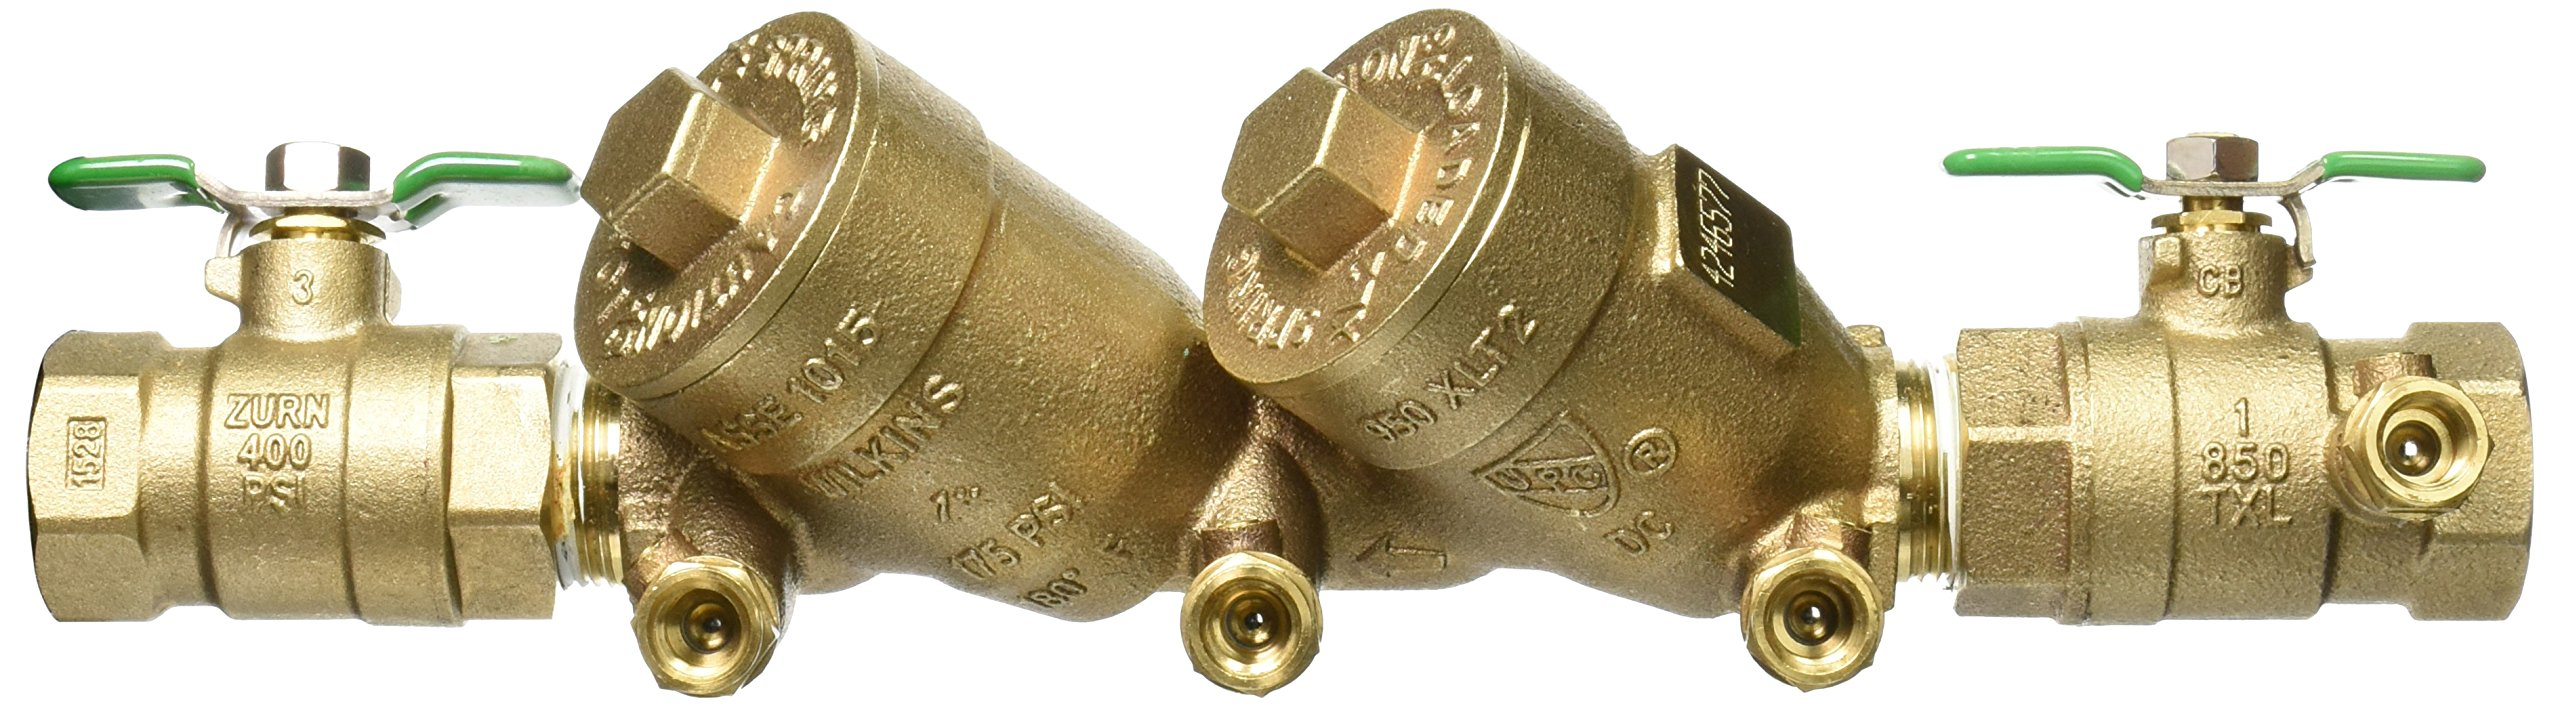 Zurn 1-950XLT2 Wilkins Double Check Valve Backflow Preventer 1'' Lead Free by Zurn (Image #4)